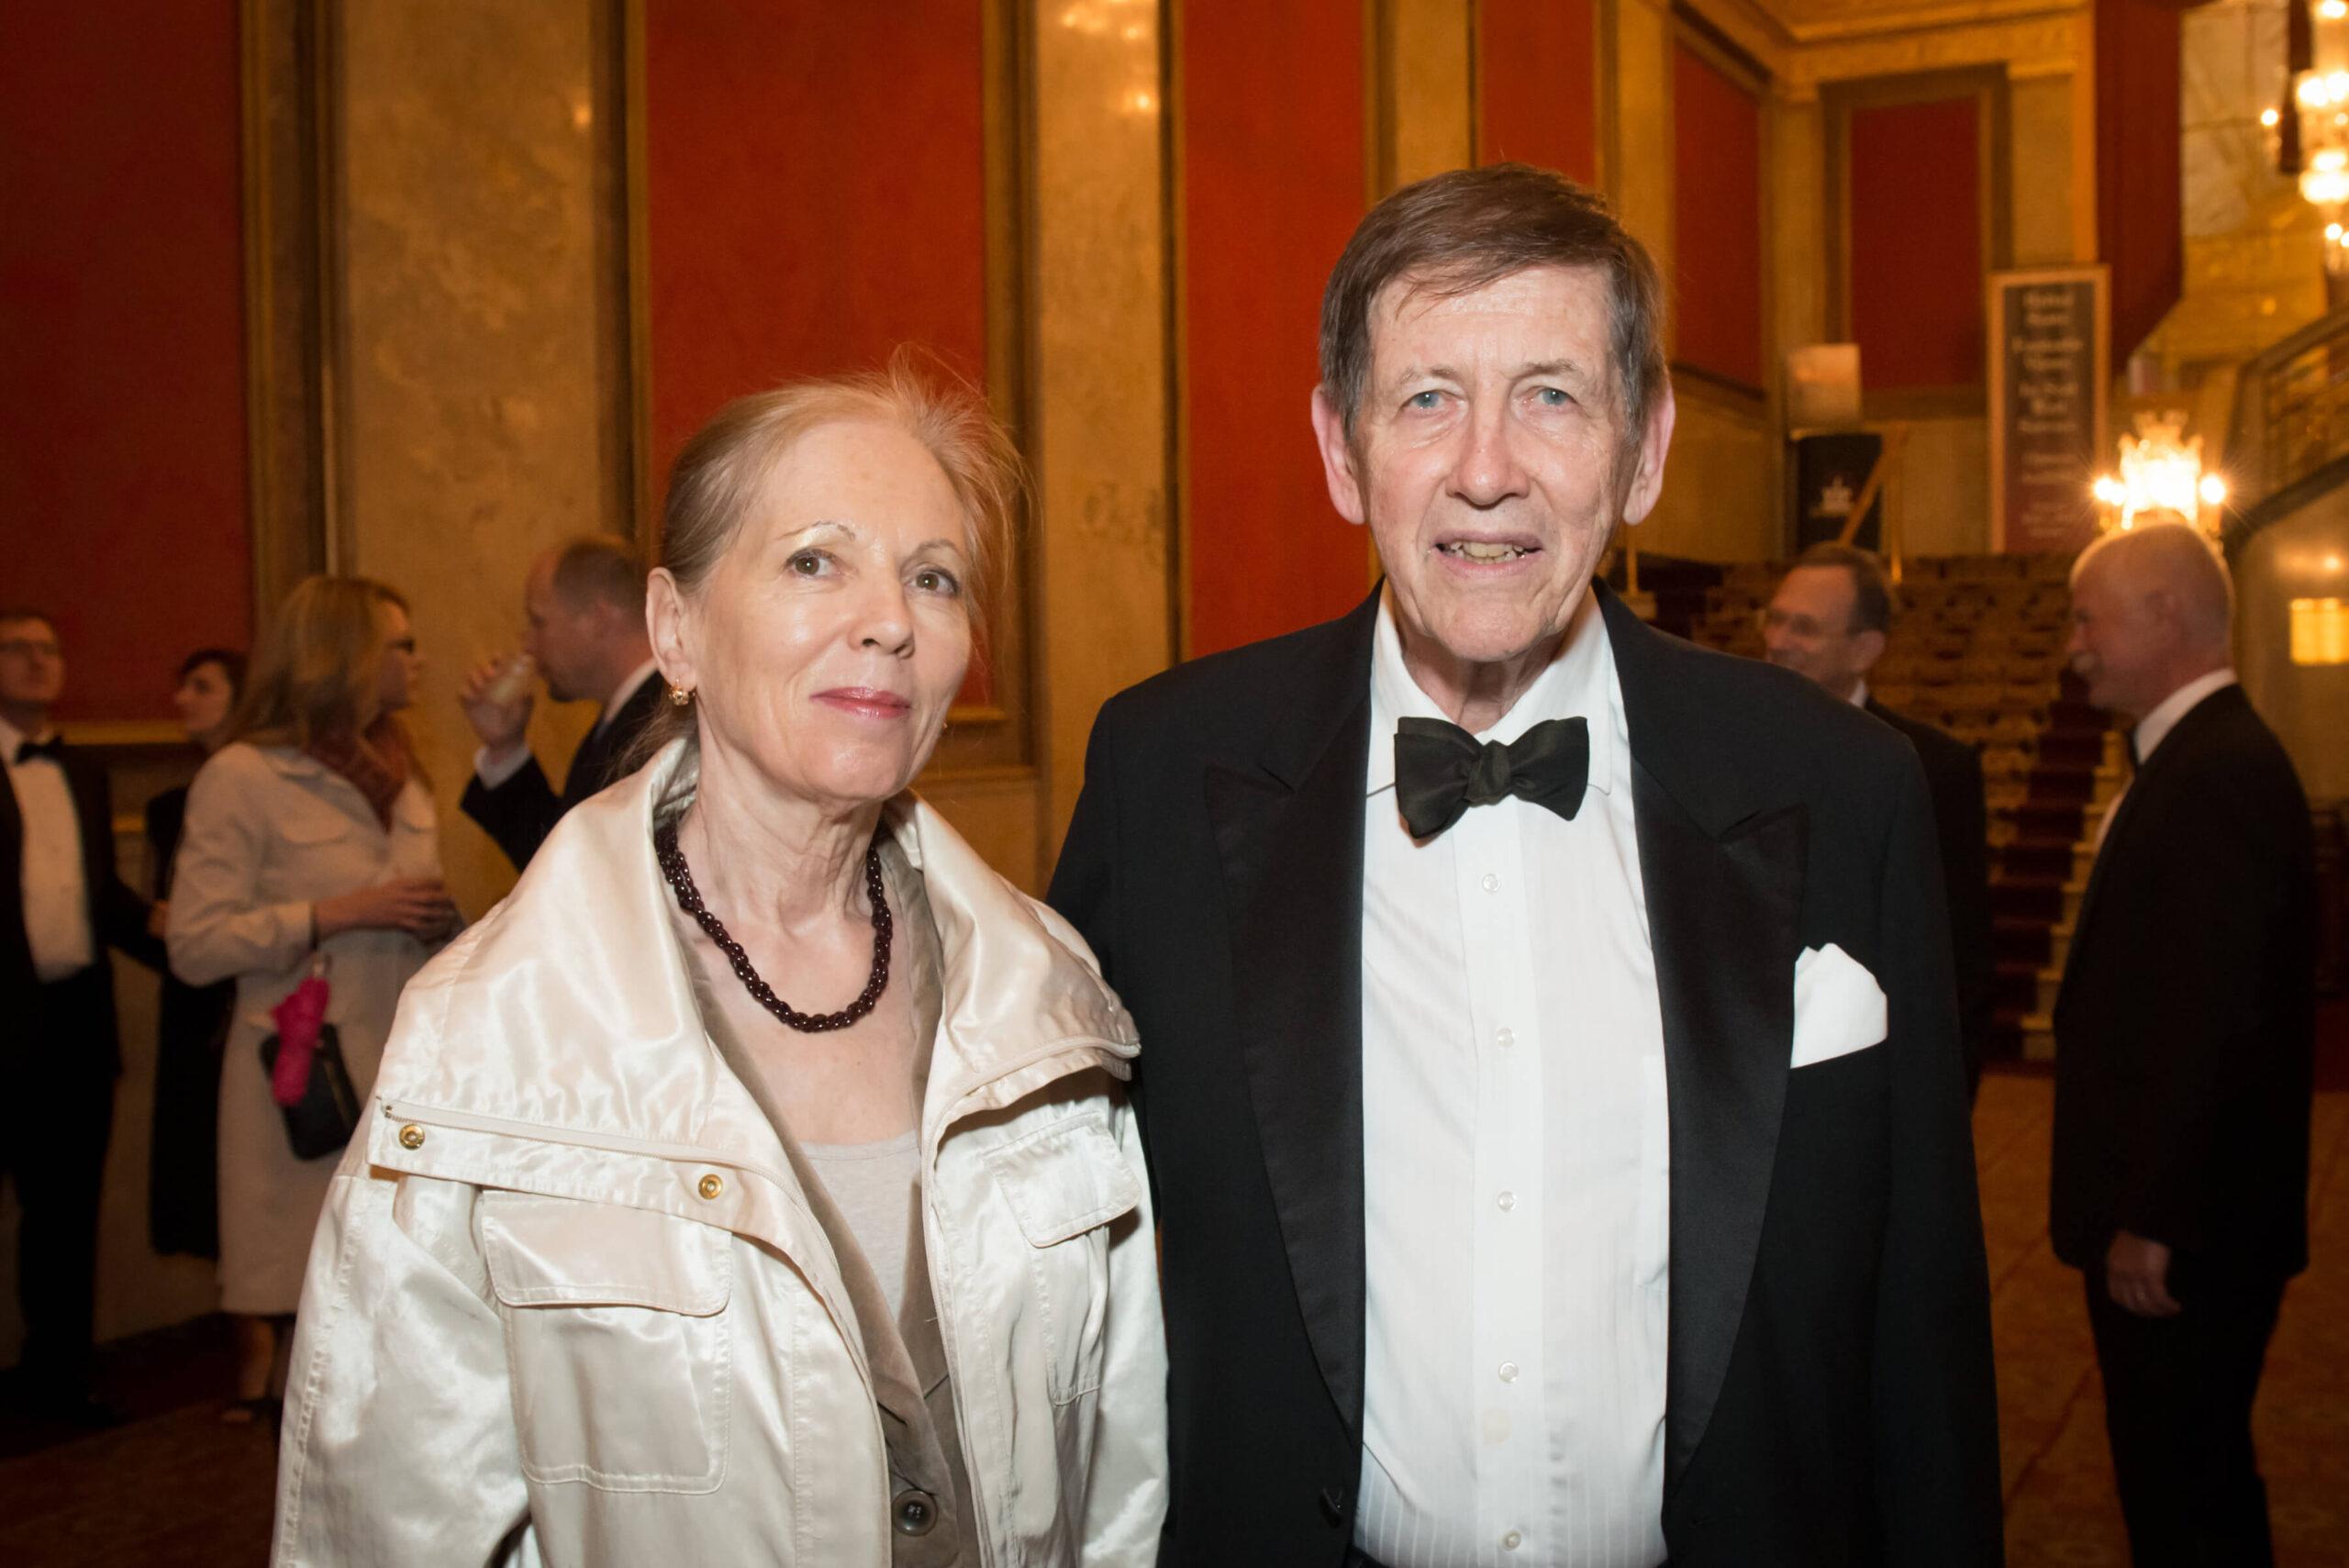 Mrs. Anikó and Mr. Blaise Pasztory